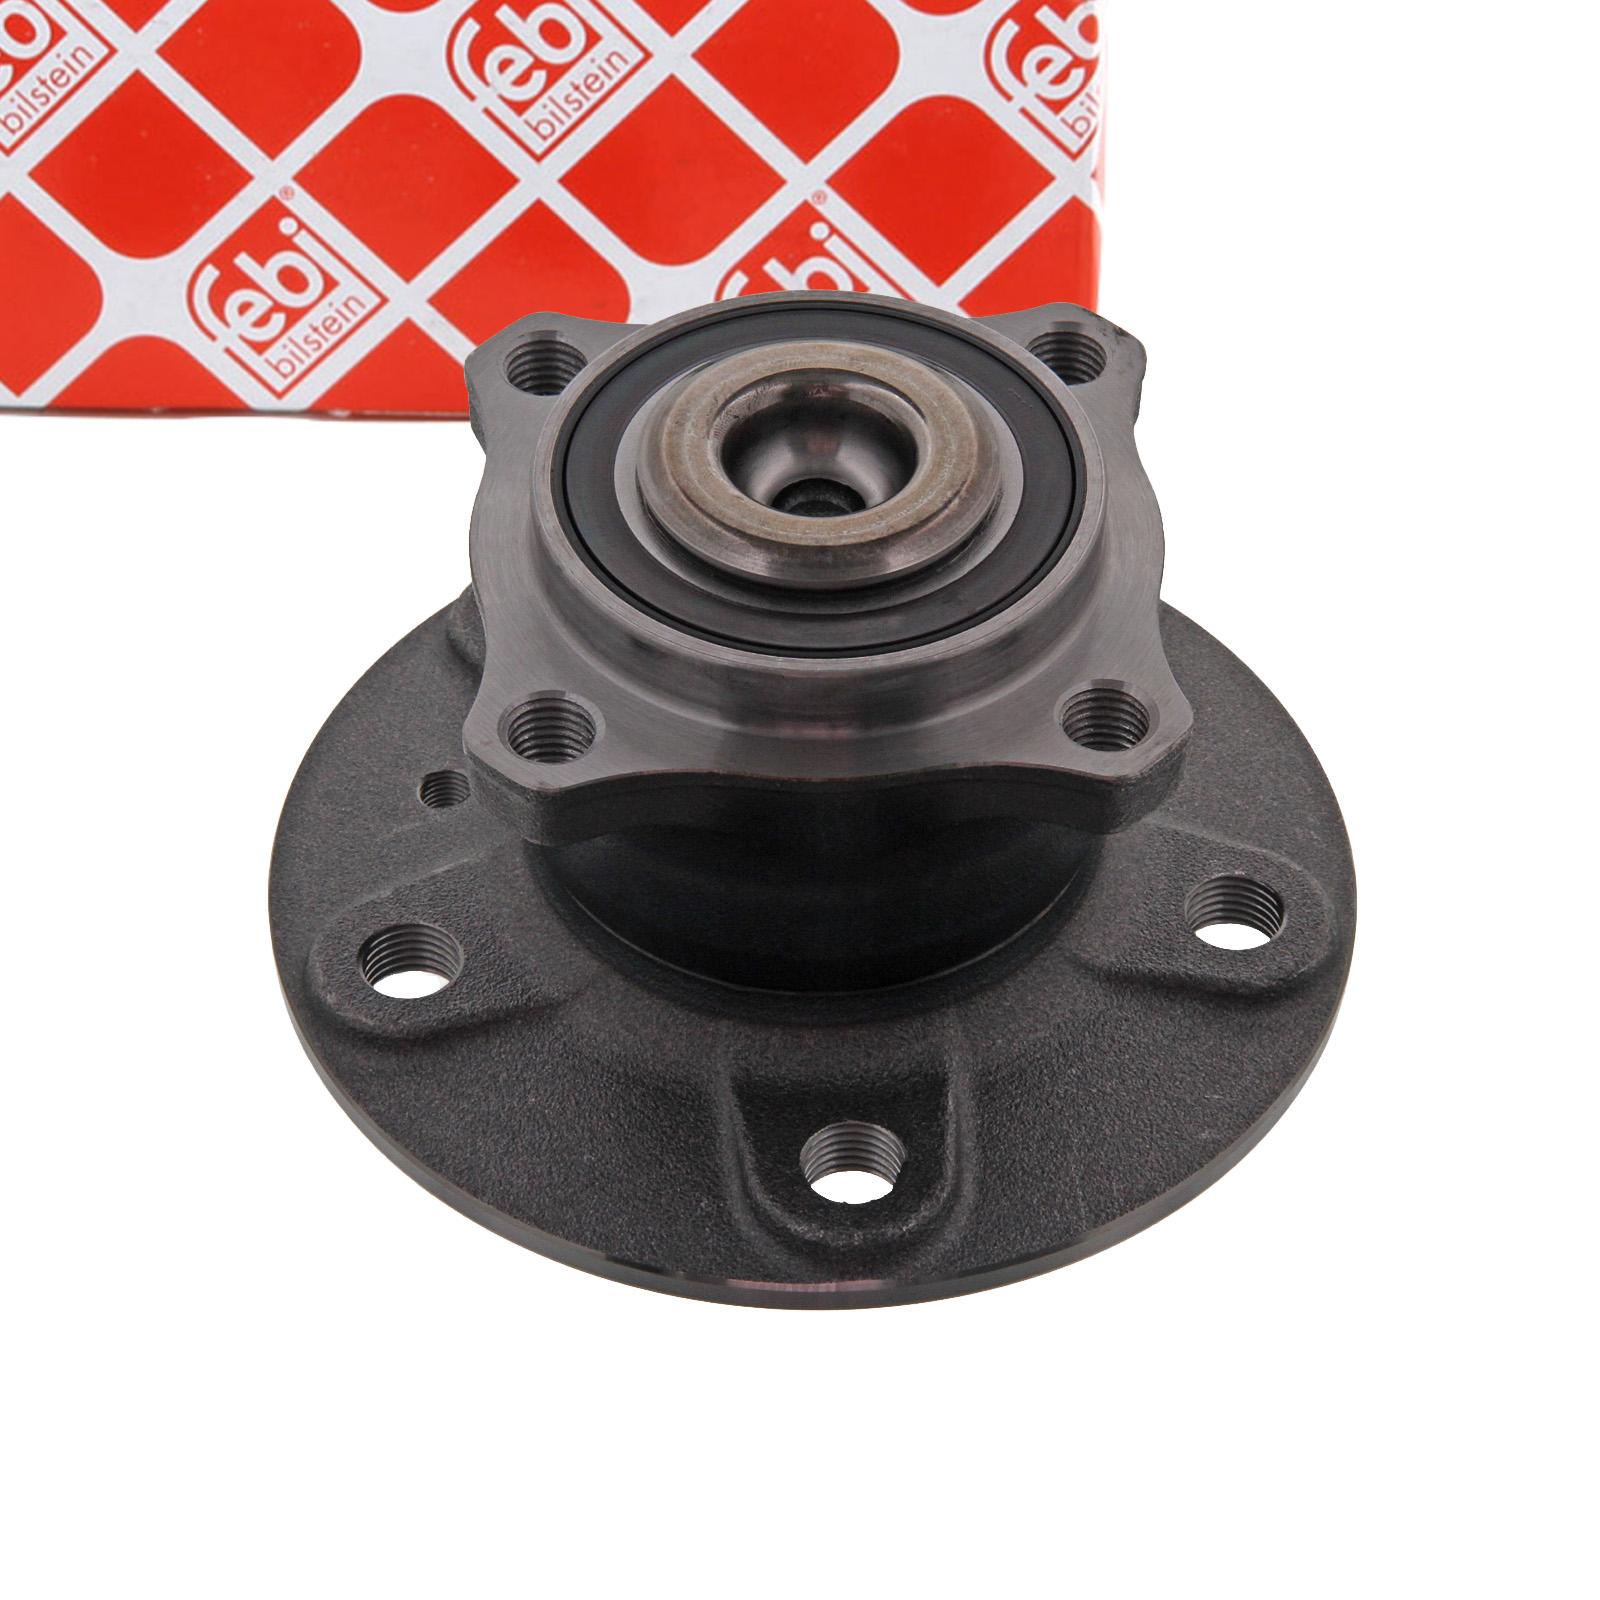 FEBI 36487 Radlagersatz Radnabe MERCEDES A-Klasse W169 A180 A180 CDI hinten A1699810027